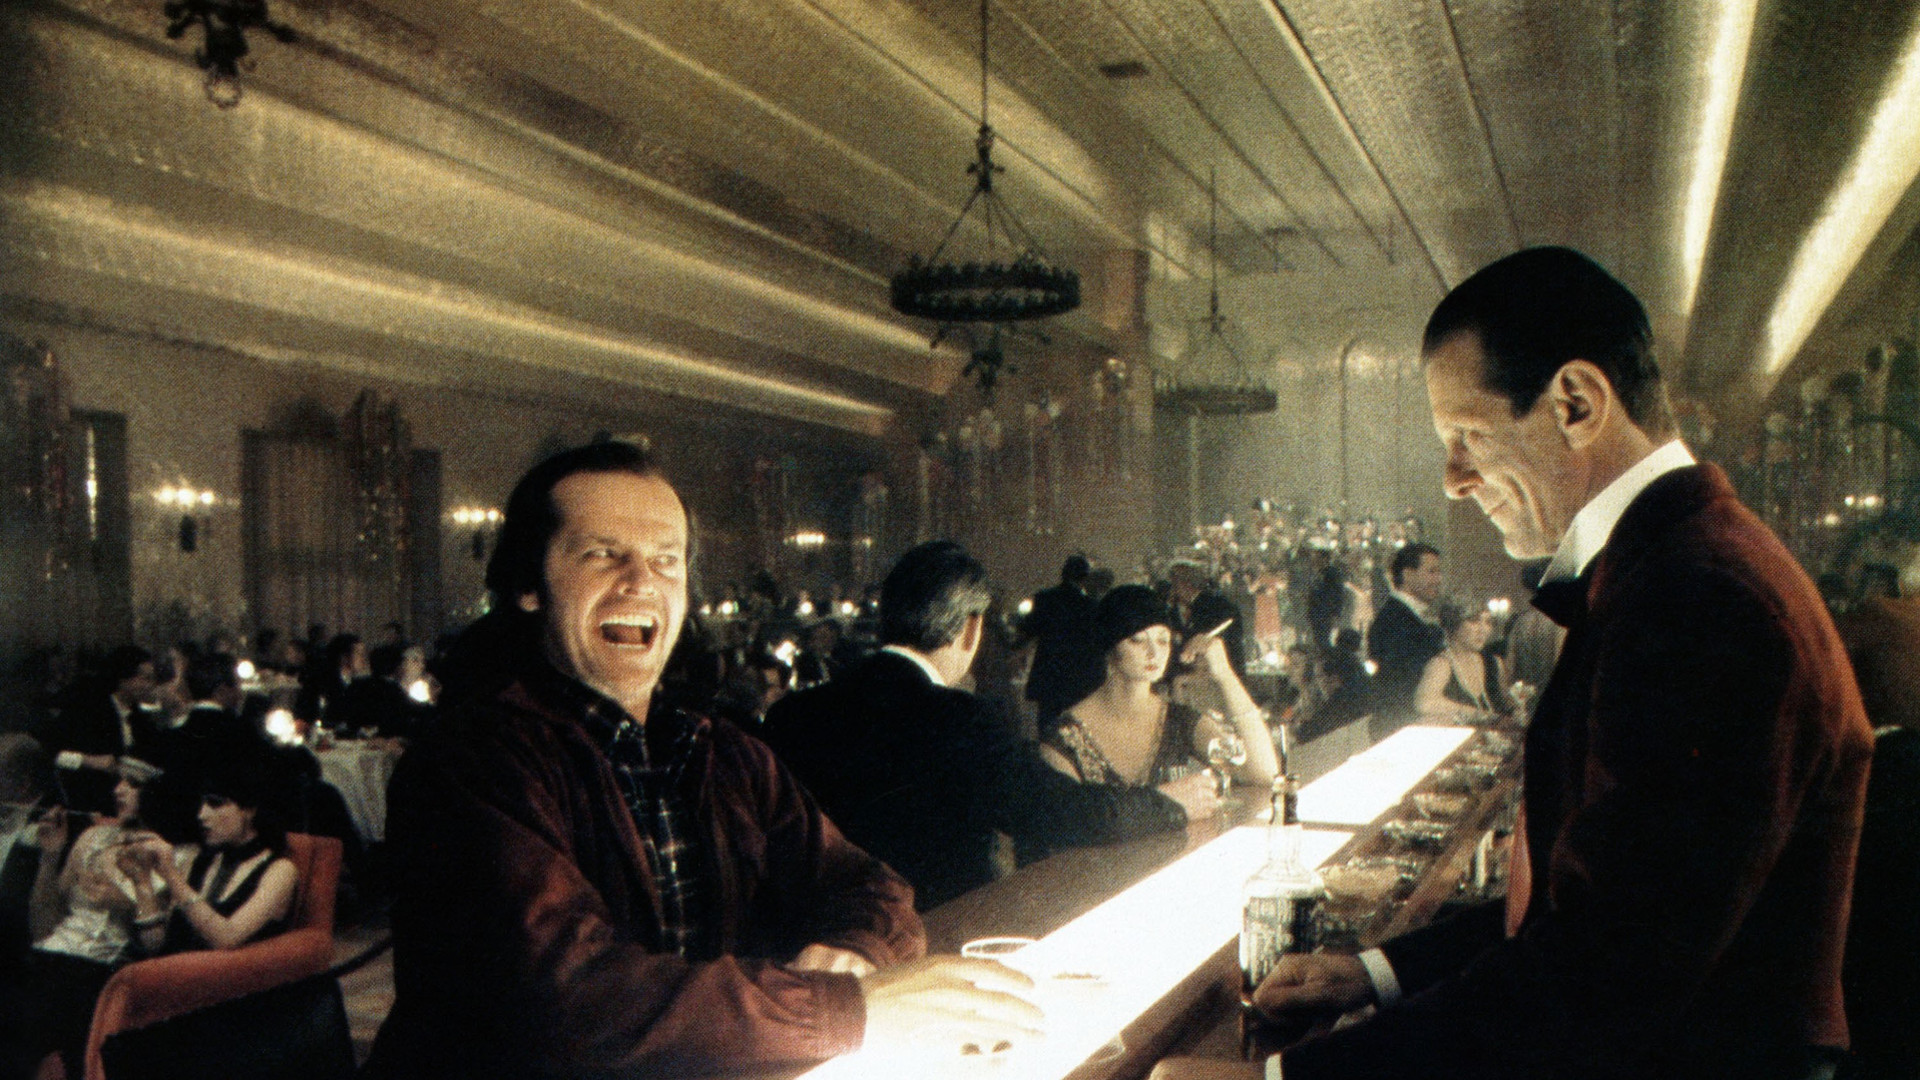 The-Shining-Jack-Nicholson-Stanley-Kubrick